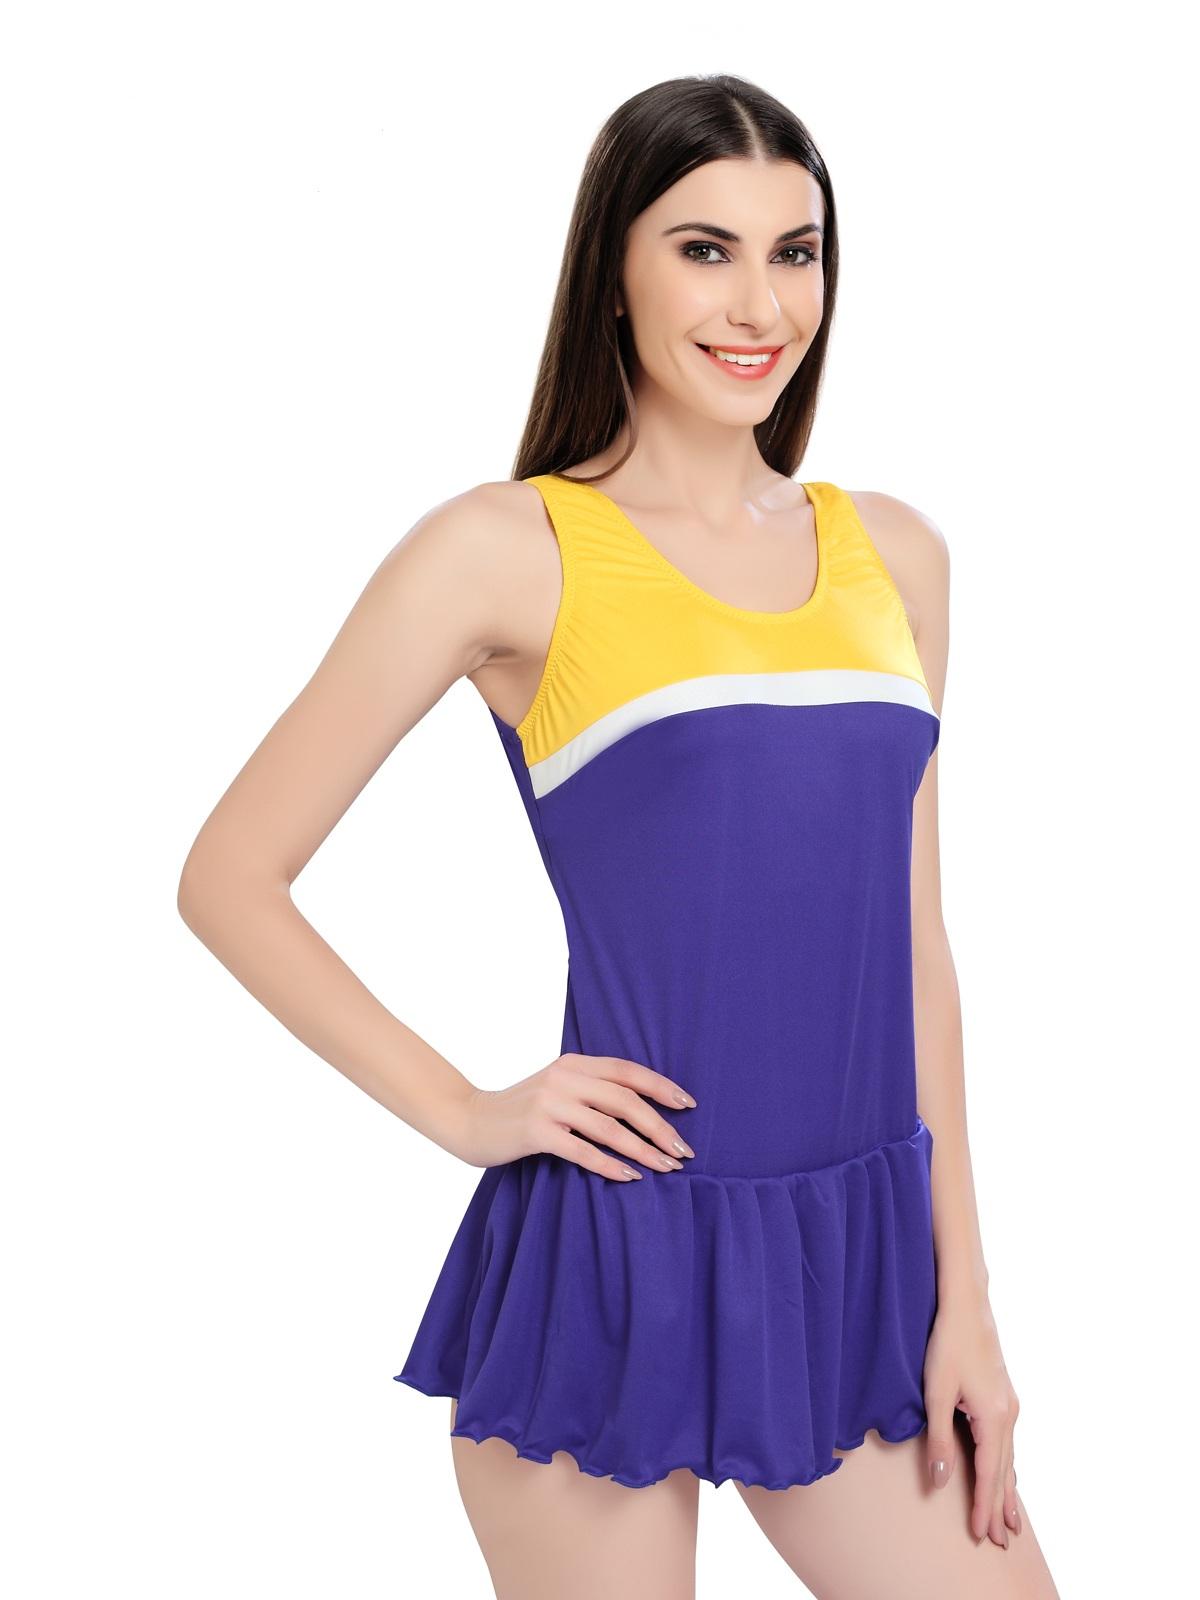 Enkay Dolphin Women Solid Swimsuit (Pack Of 1)